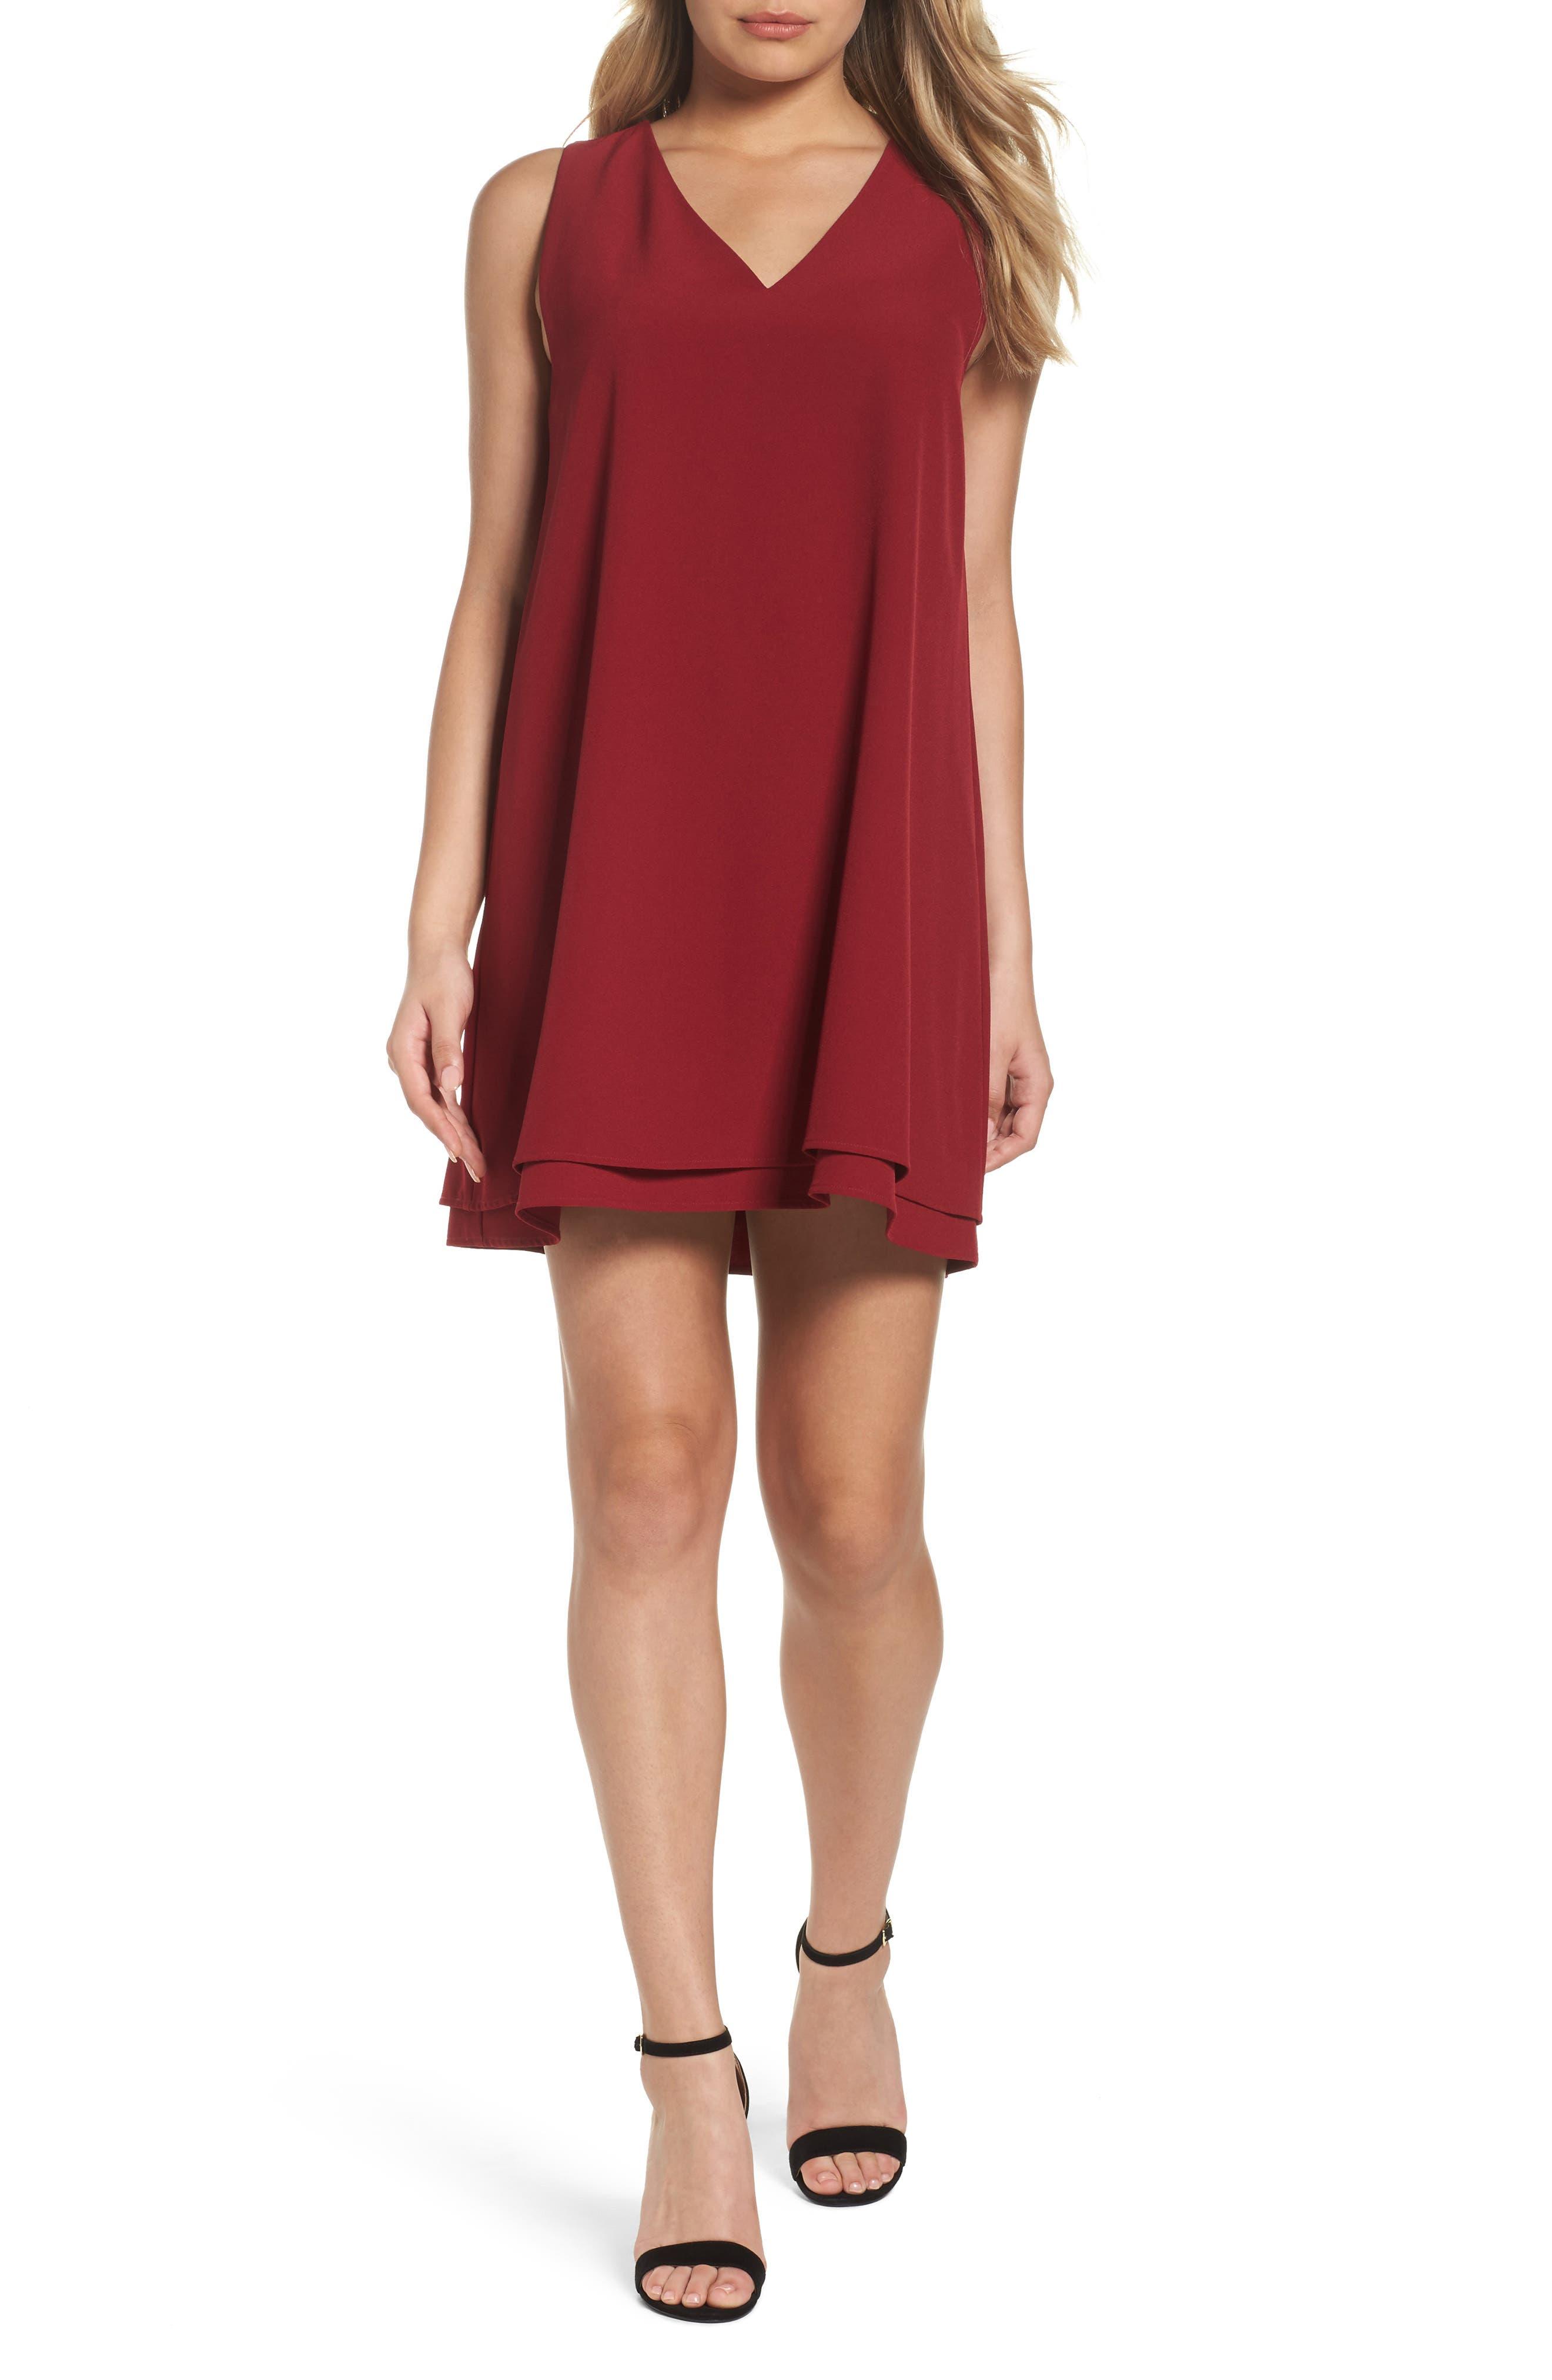 Alternate Image 1 Selected - BB Dakota 'Palma' Crepe Shift Dress